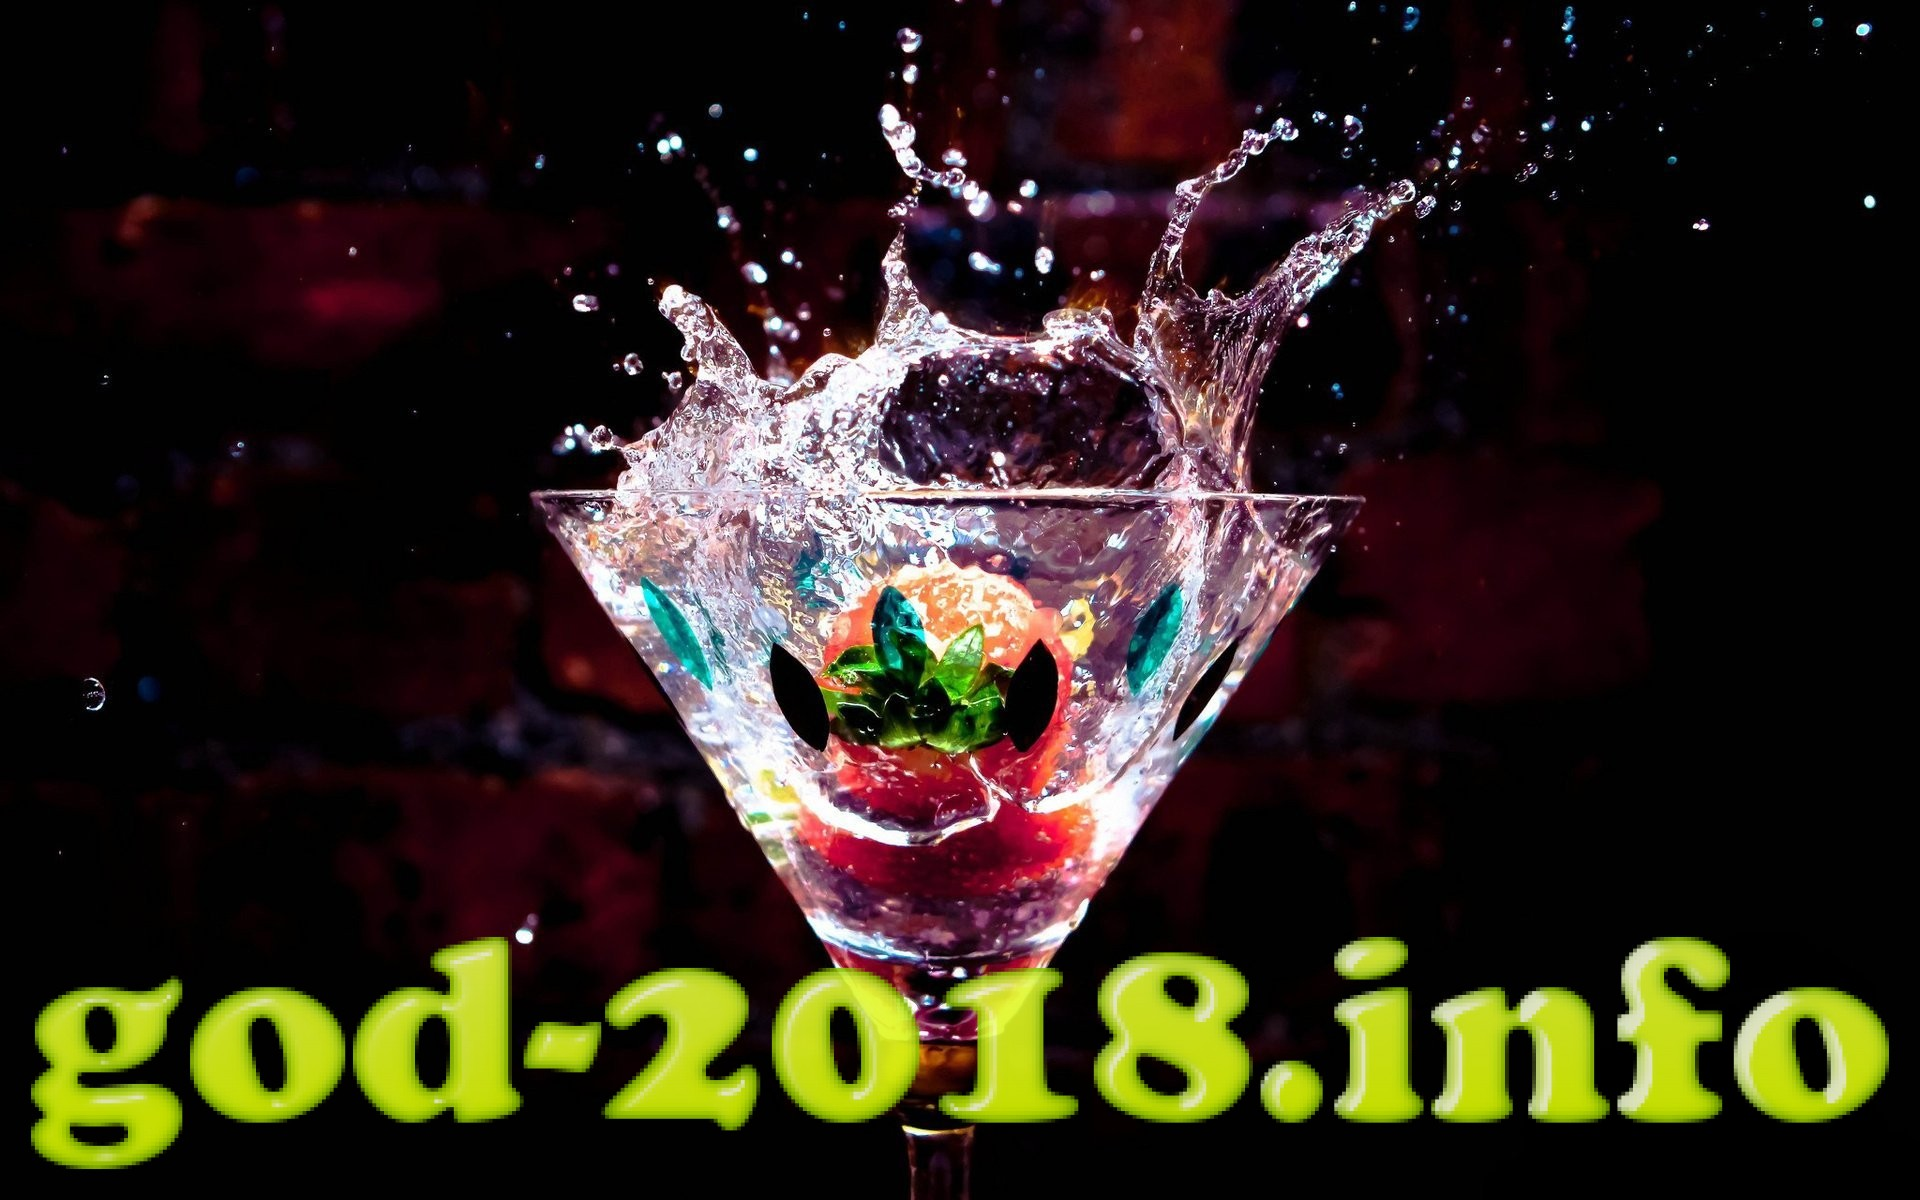 chto-pit-na-novyj-god-2018-sobaki-recepty-koktejlej